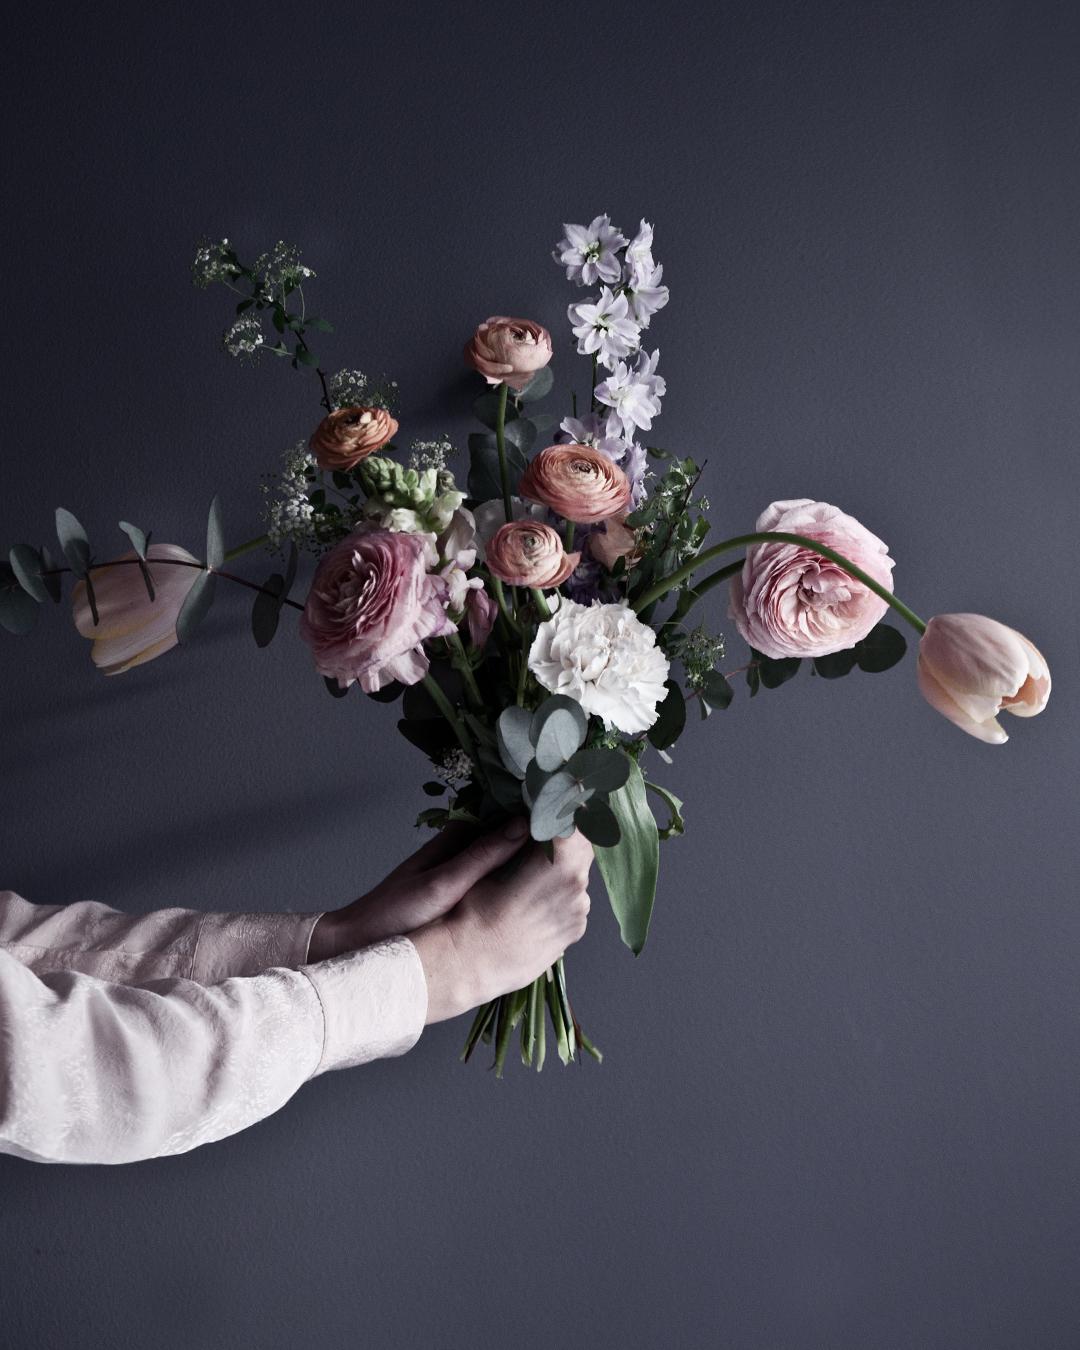 Beställa blommor online